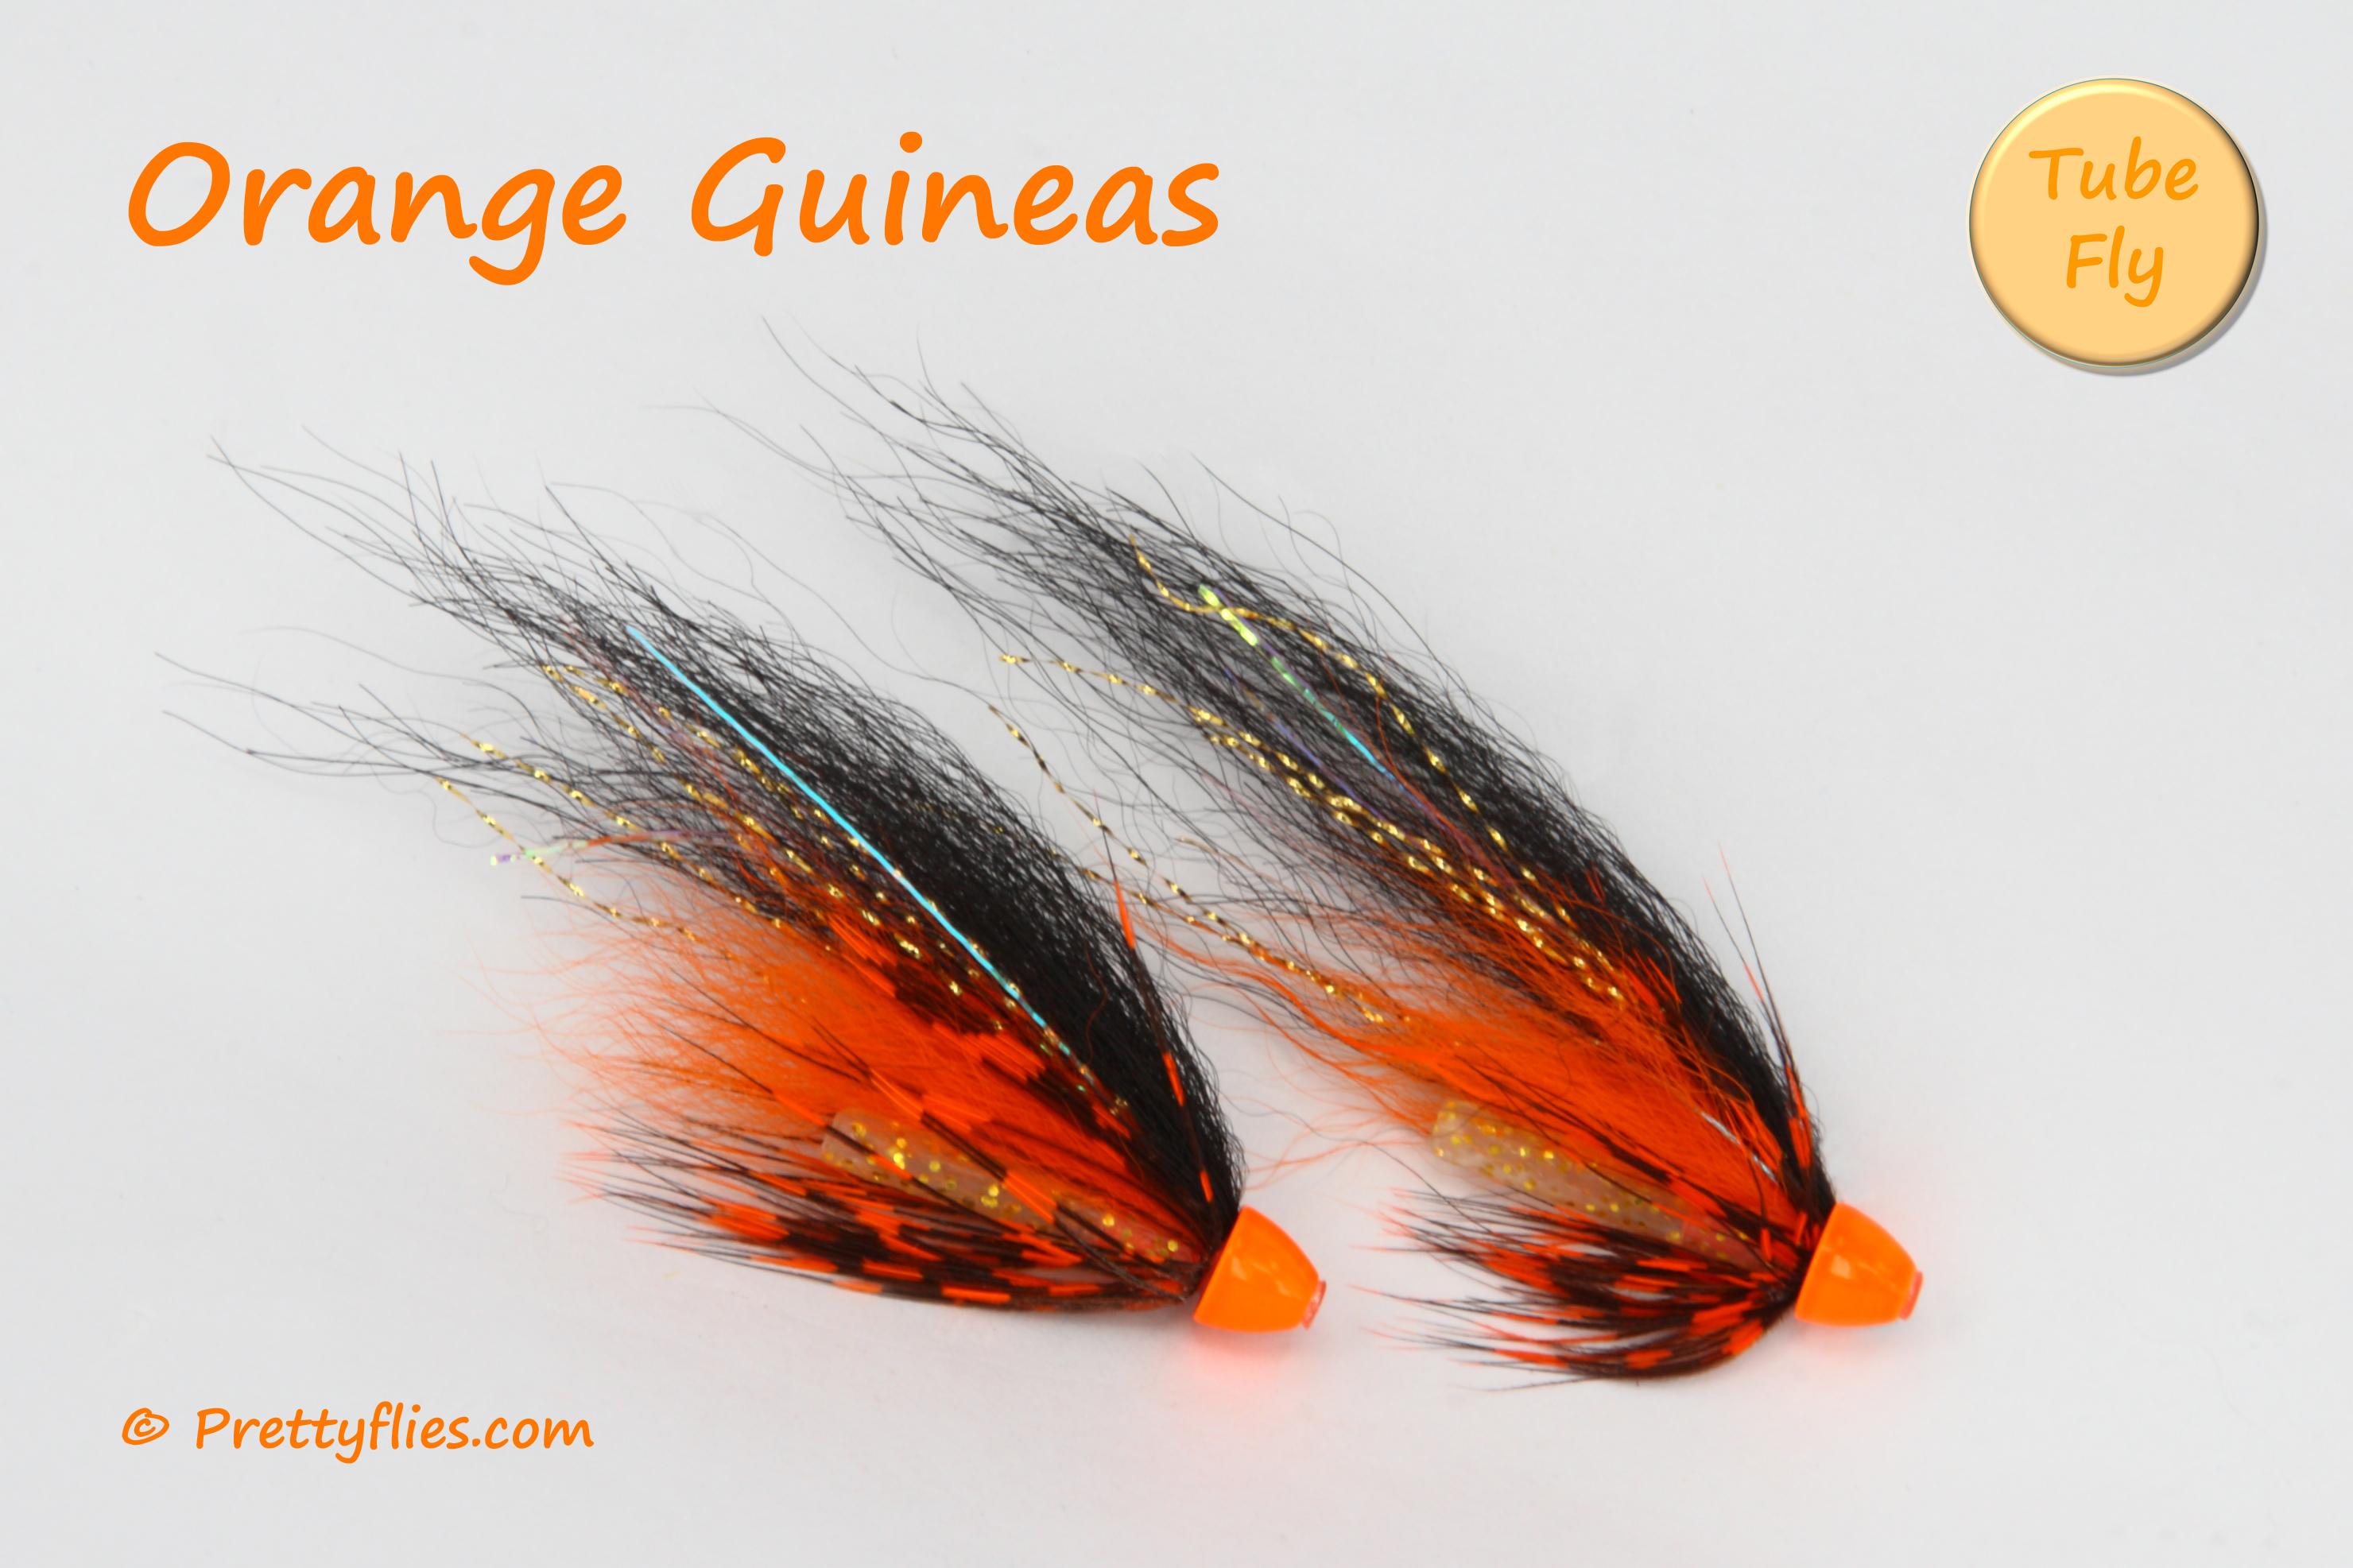 Orange Guineas copy.jpg